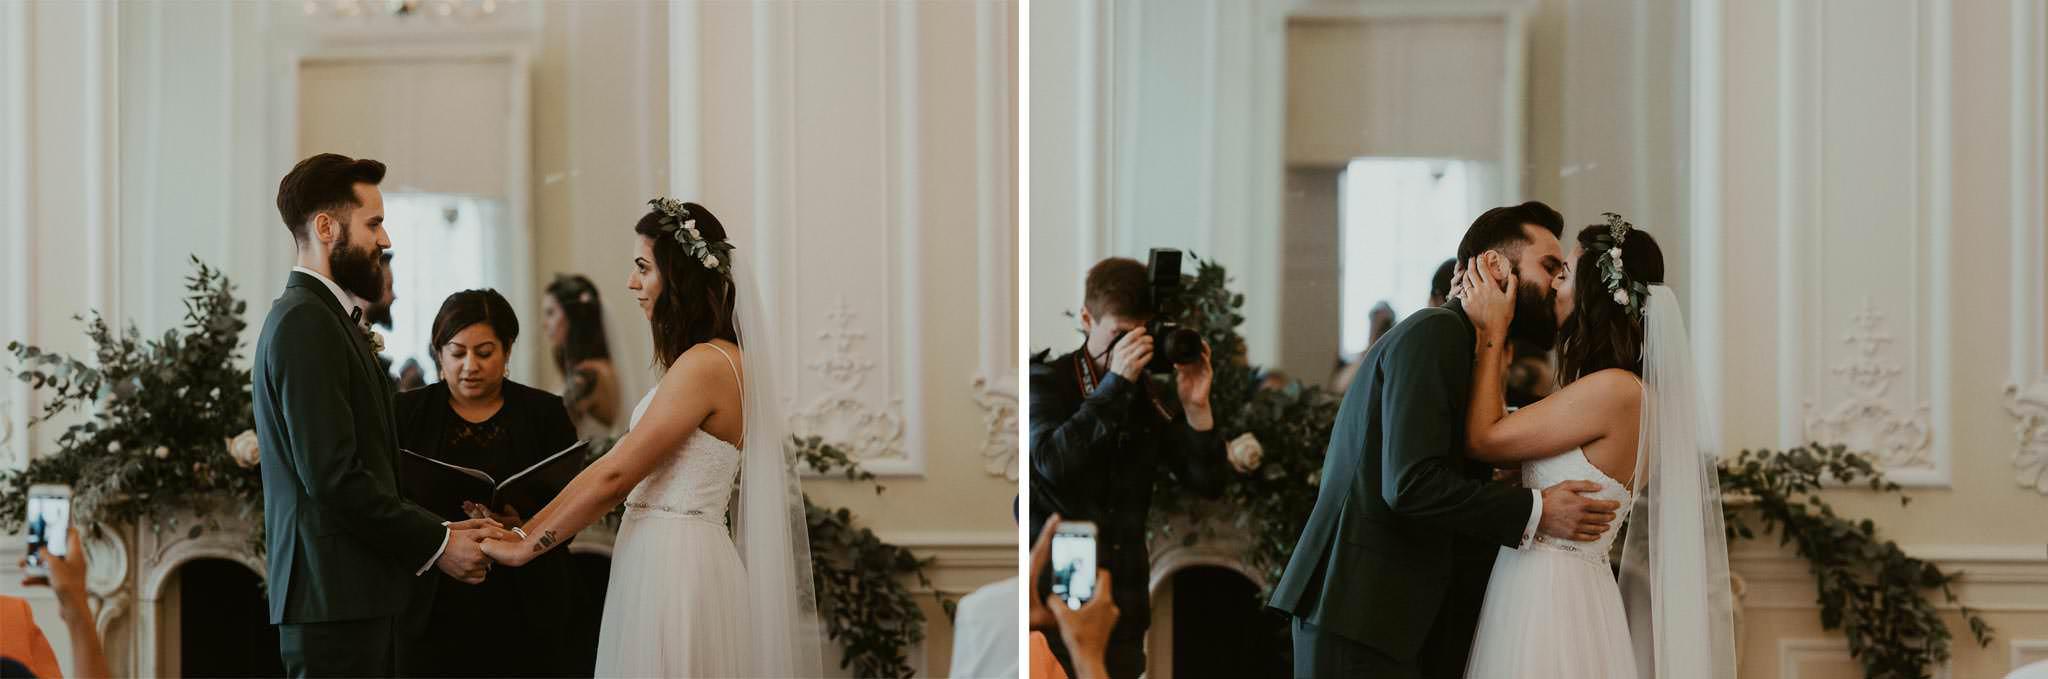 hipster-wedding-london 098